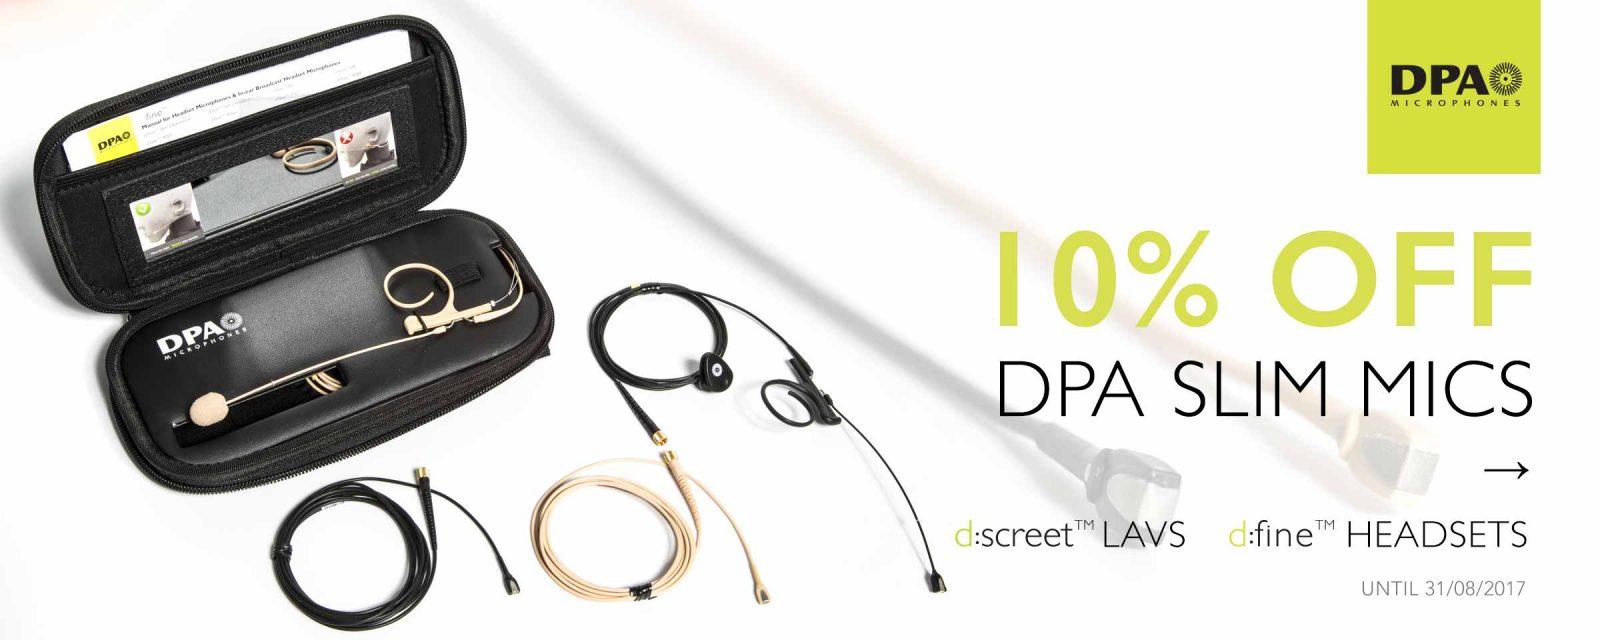 DPA 10% off Slims